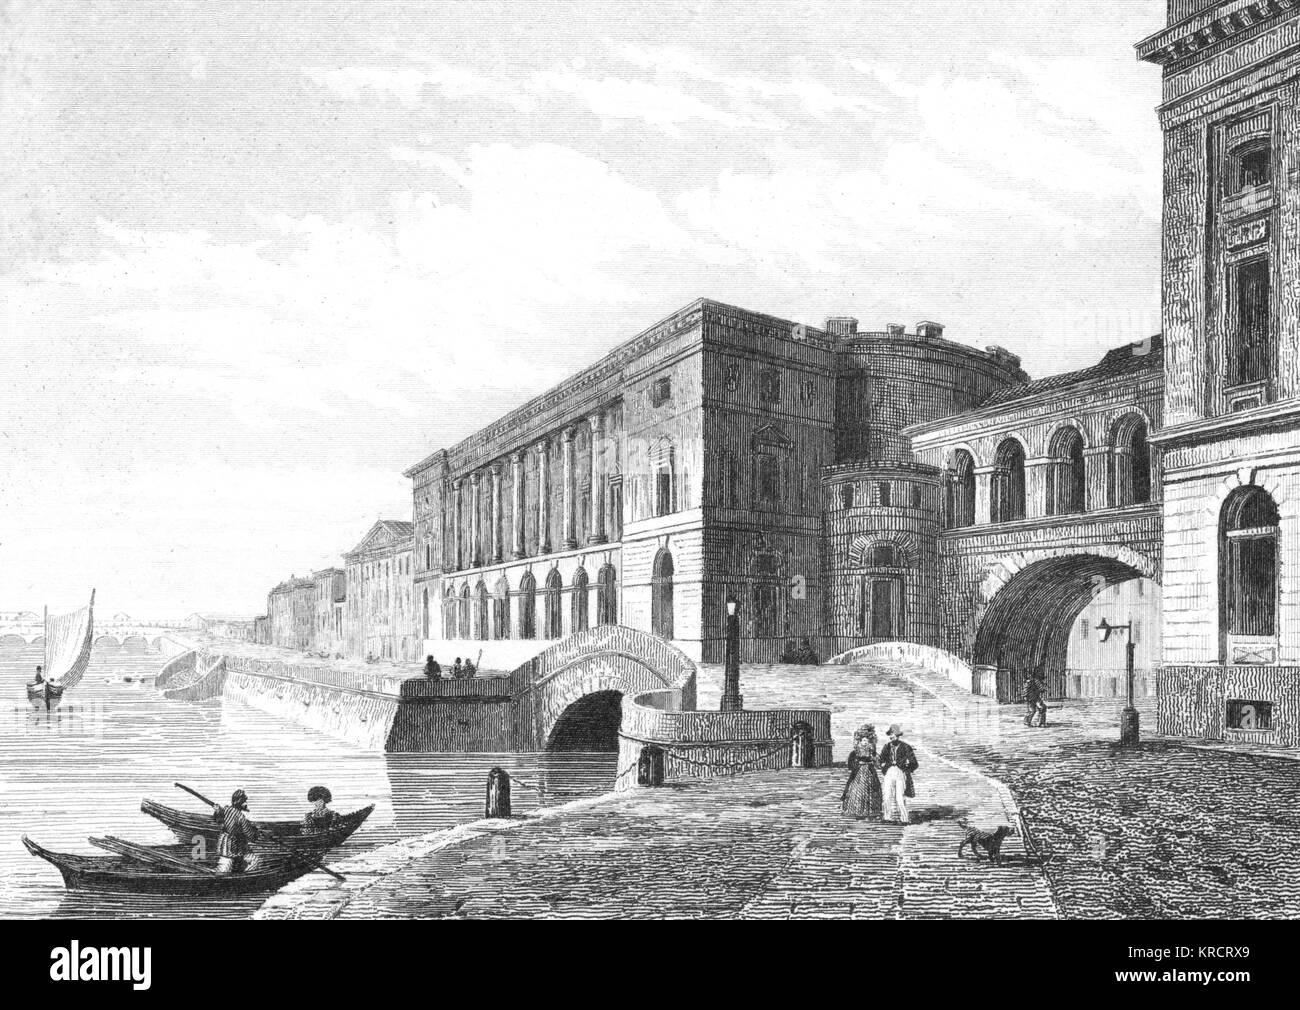 The Hermitage theatre Date: 1830s - Stock Image